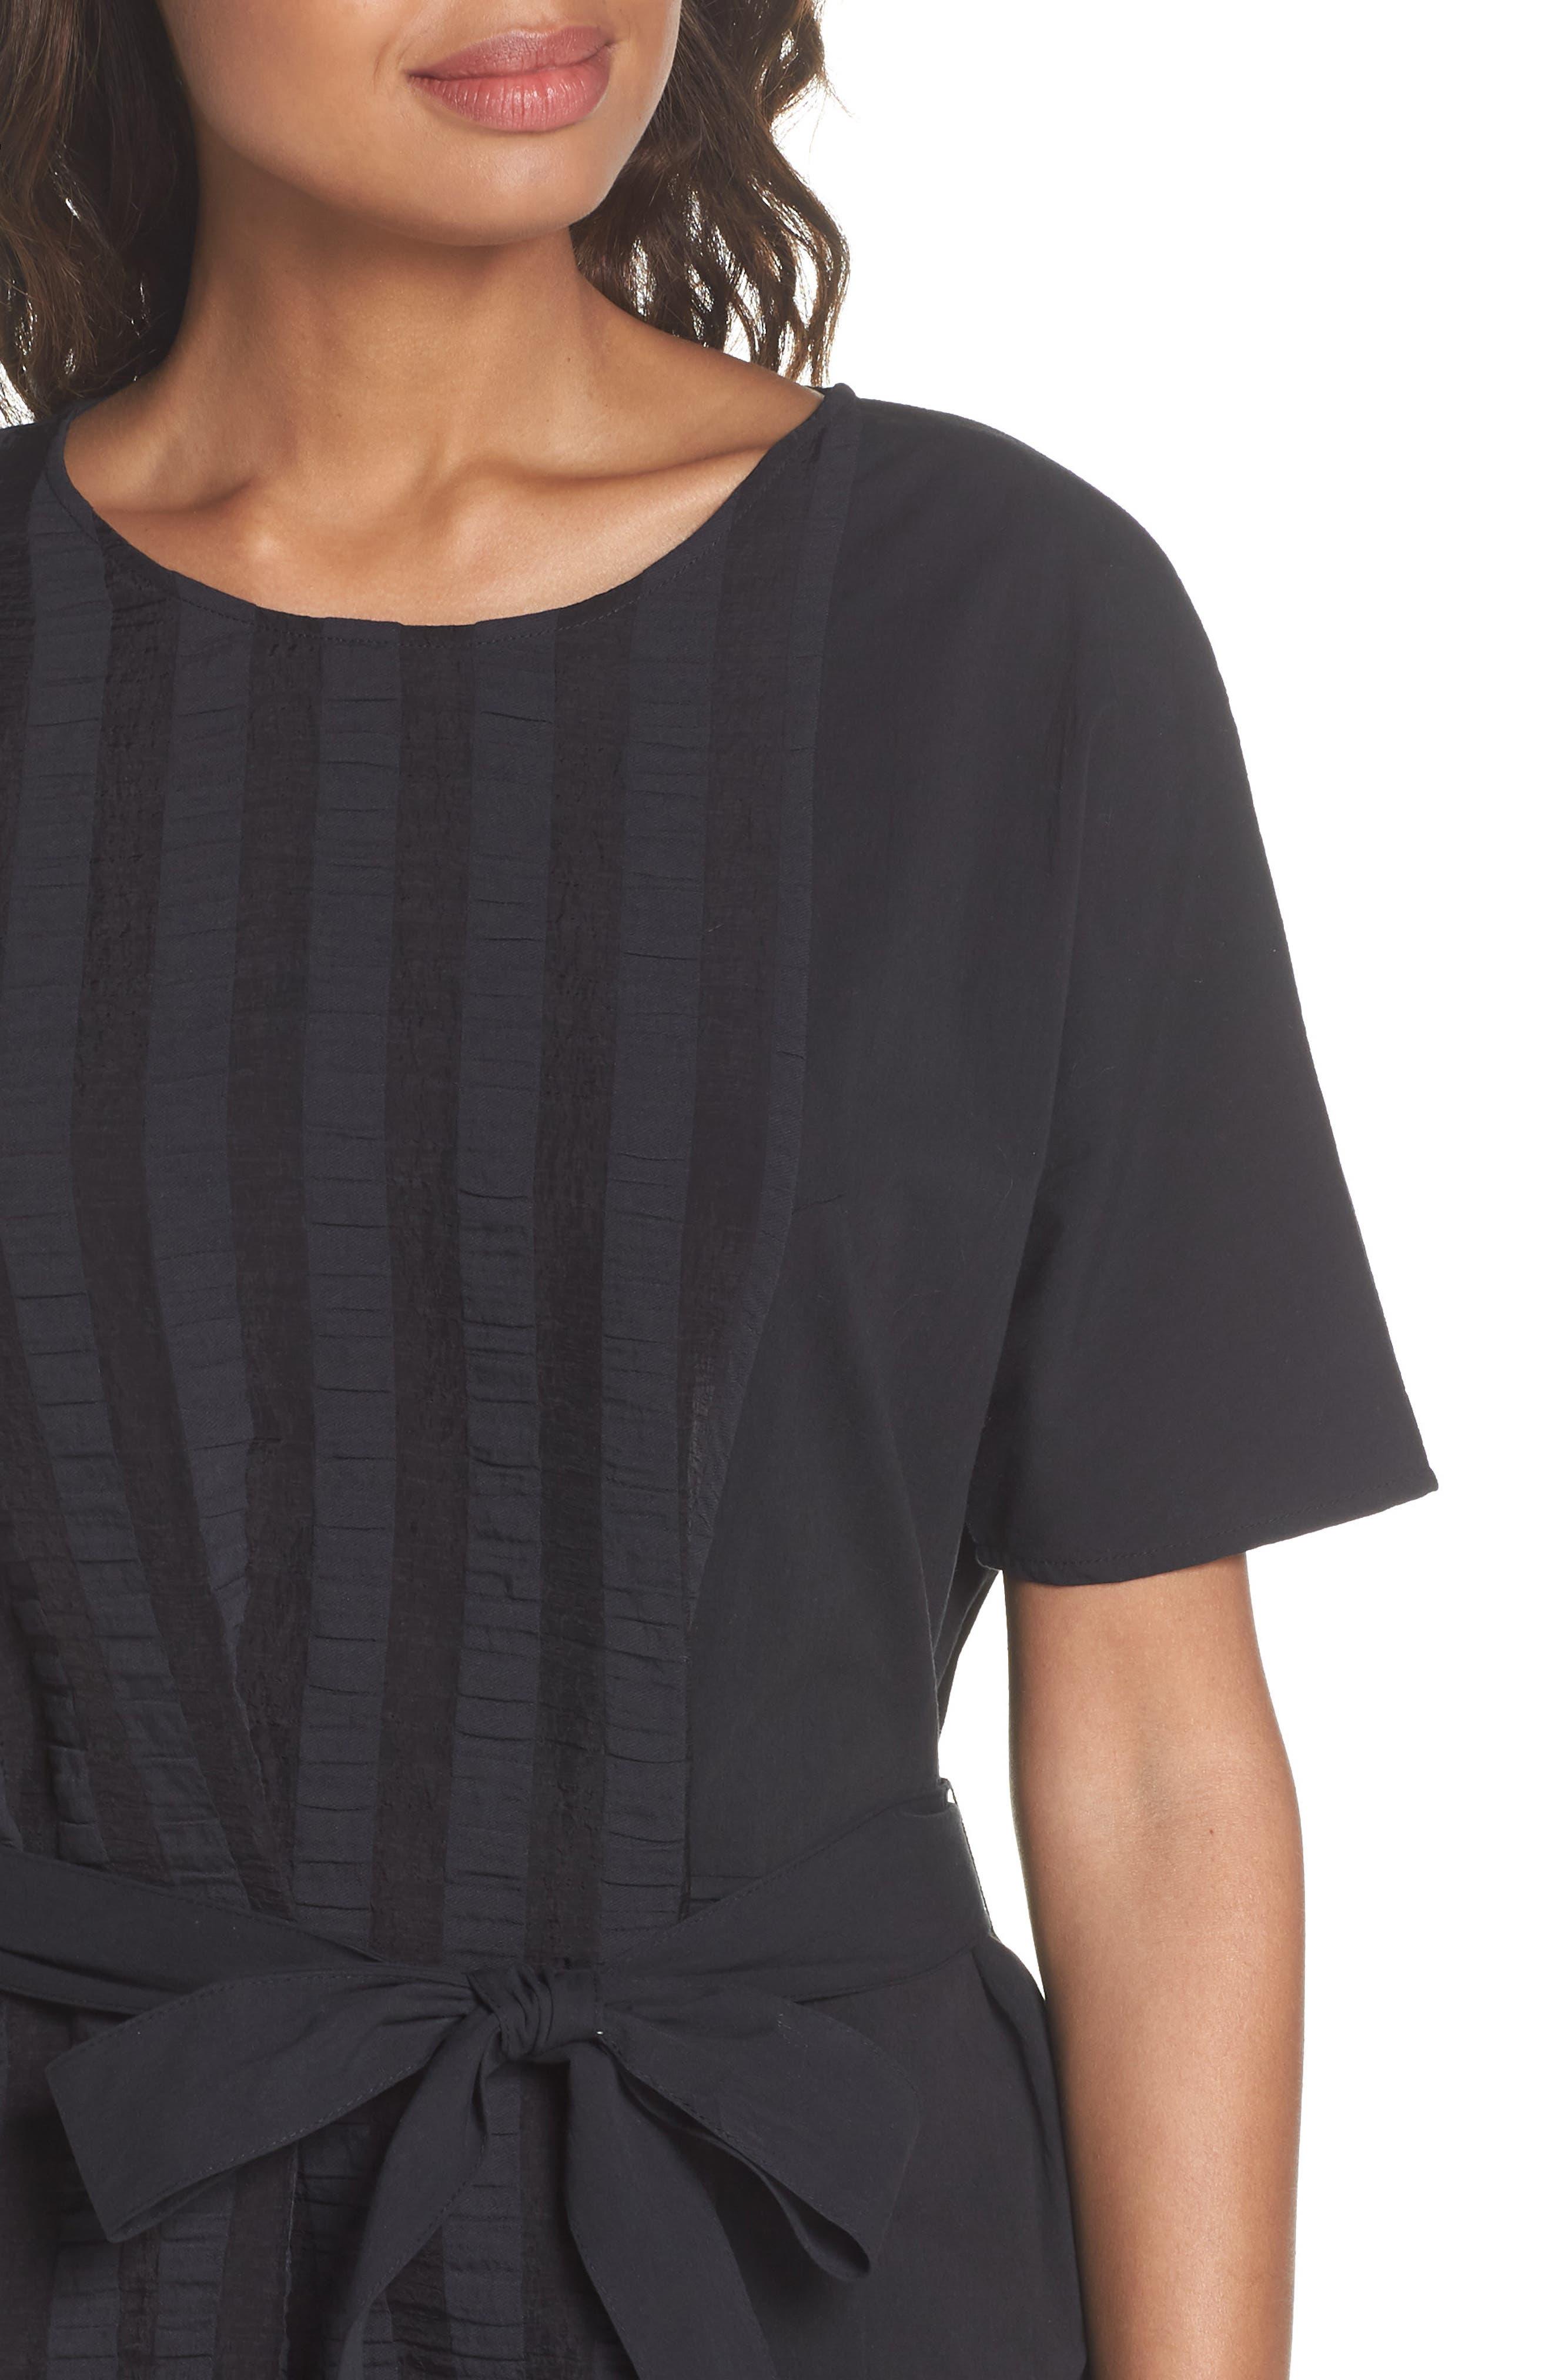 Throwing Shade Midi Dress,                             Alternate thumbnail 4, color,                             Black